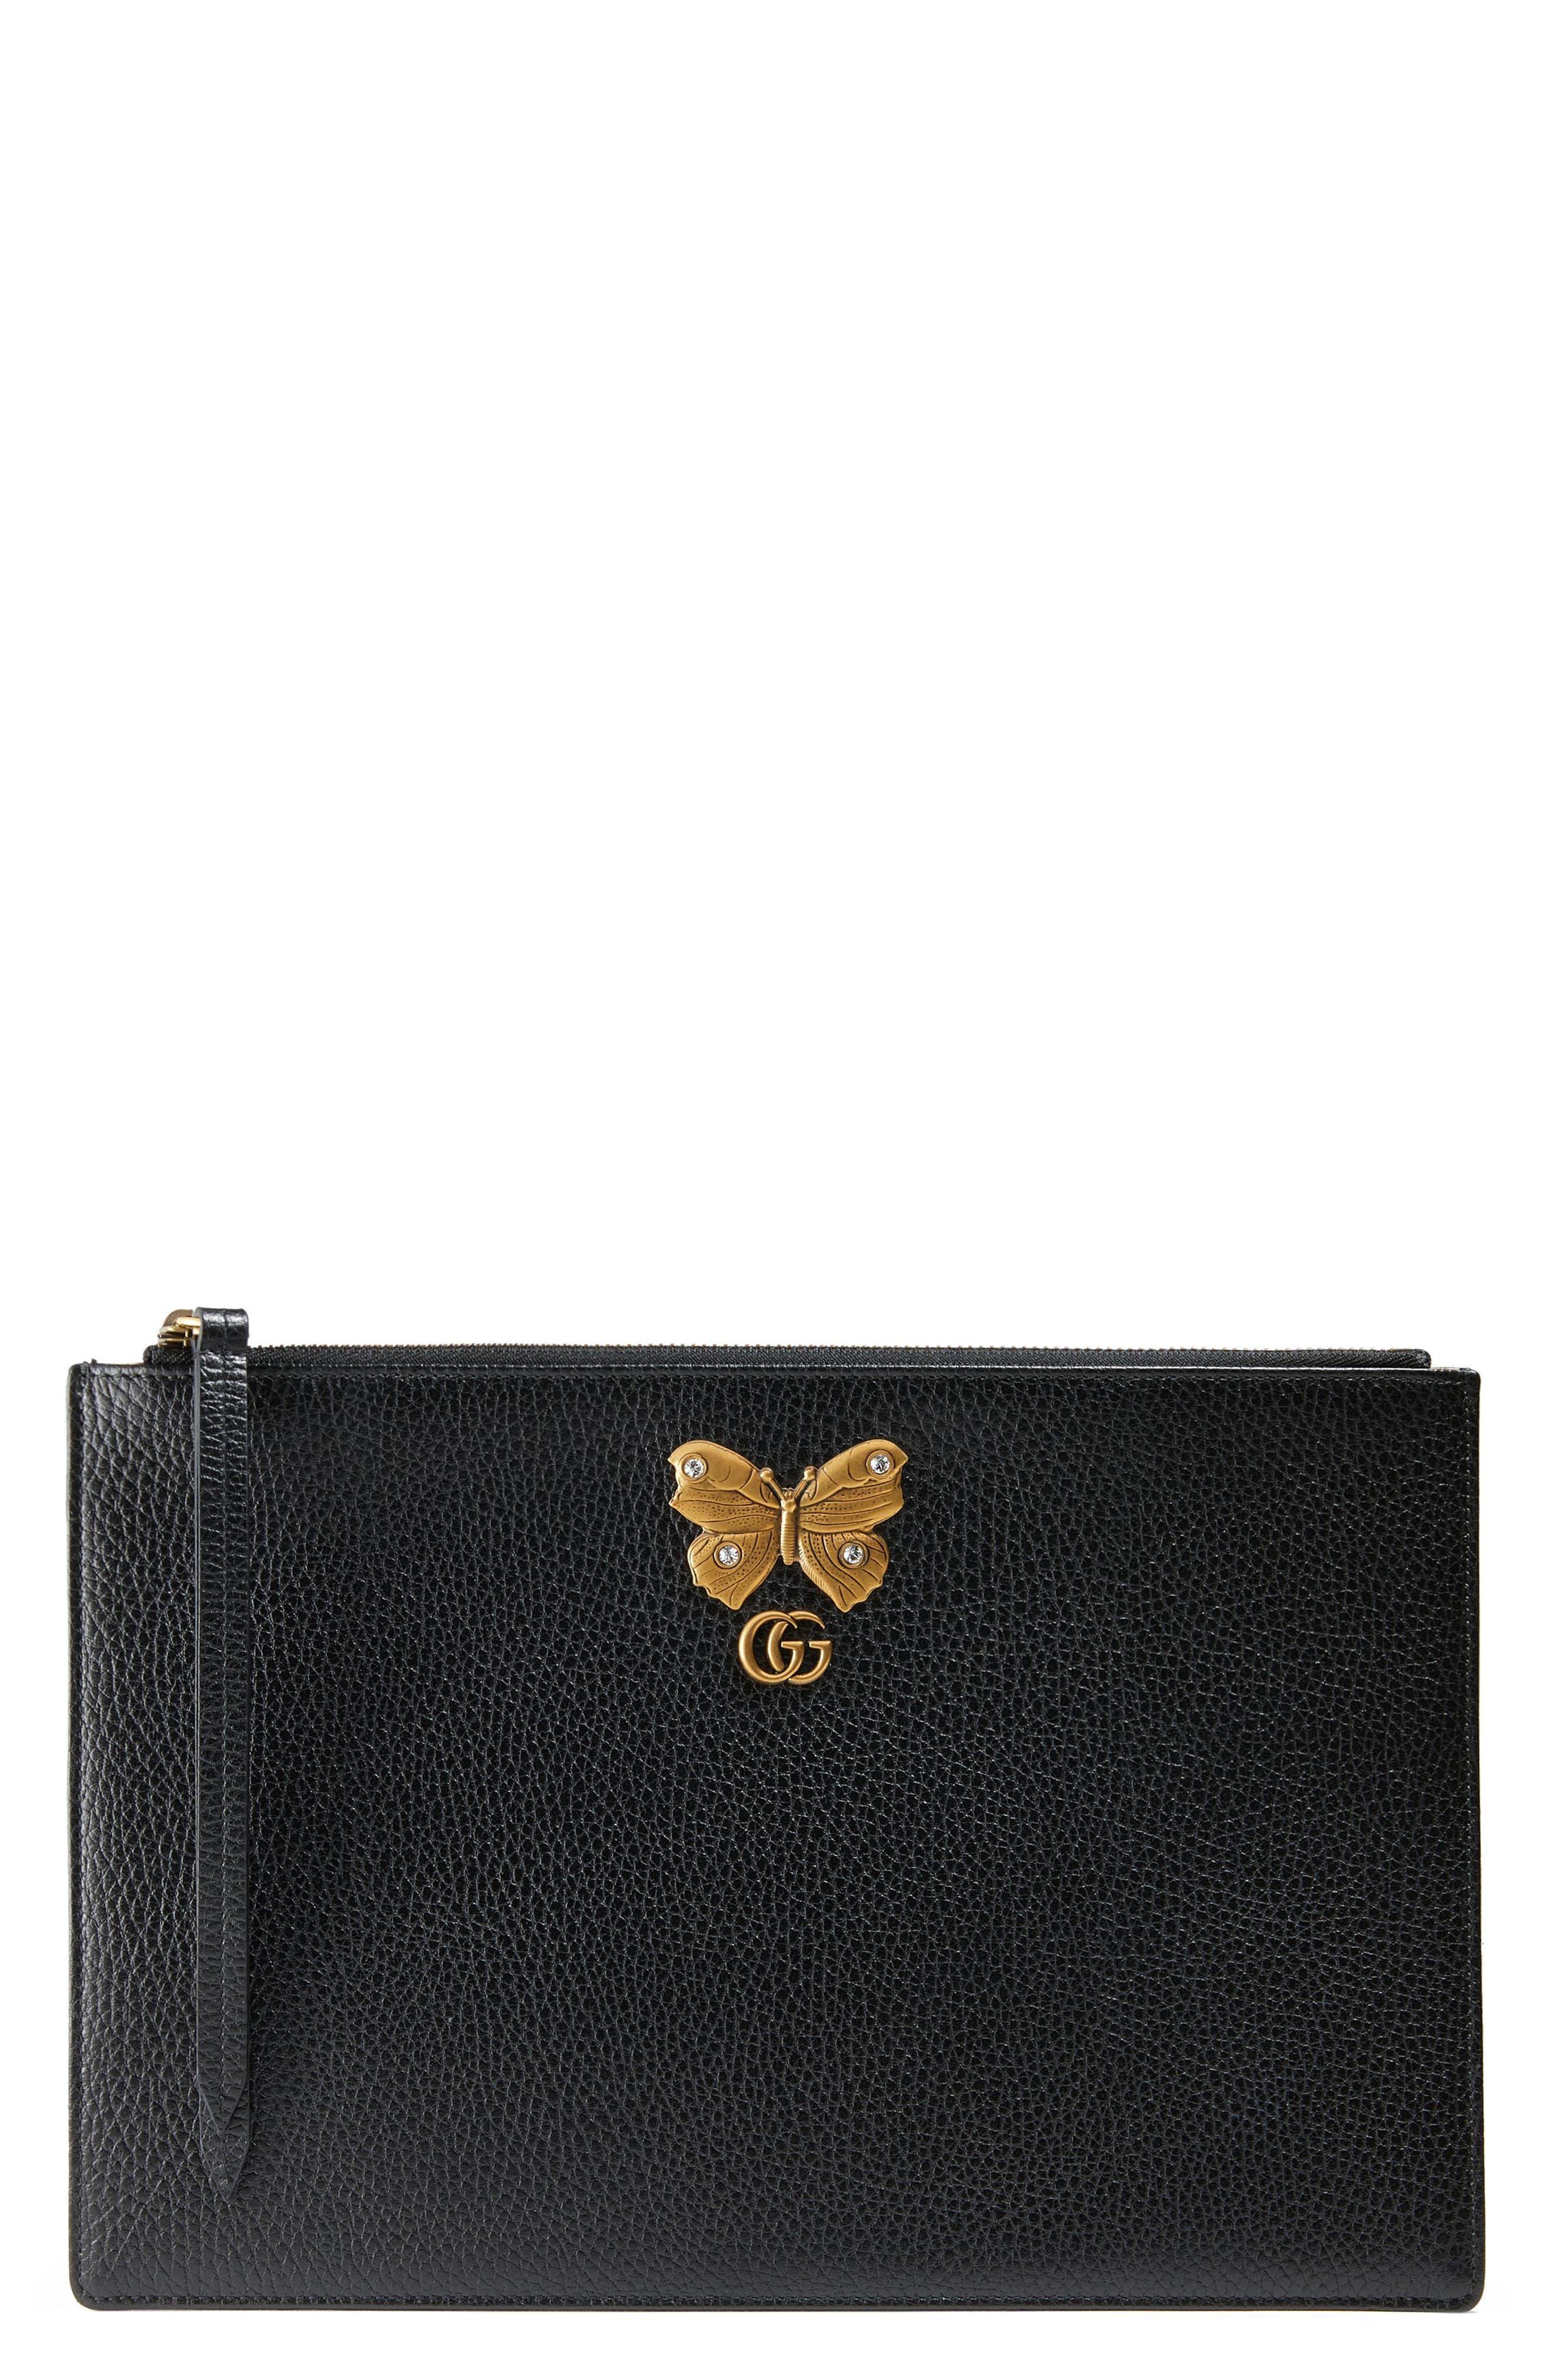 Alternate Image 1 Selected - Gucci Linea Farfalla Leather Pouch